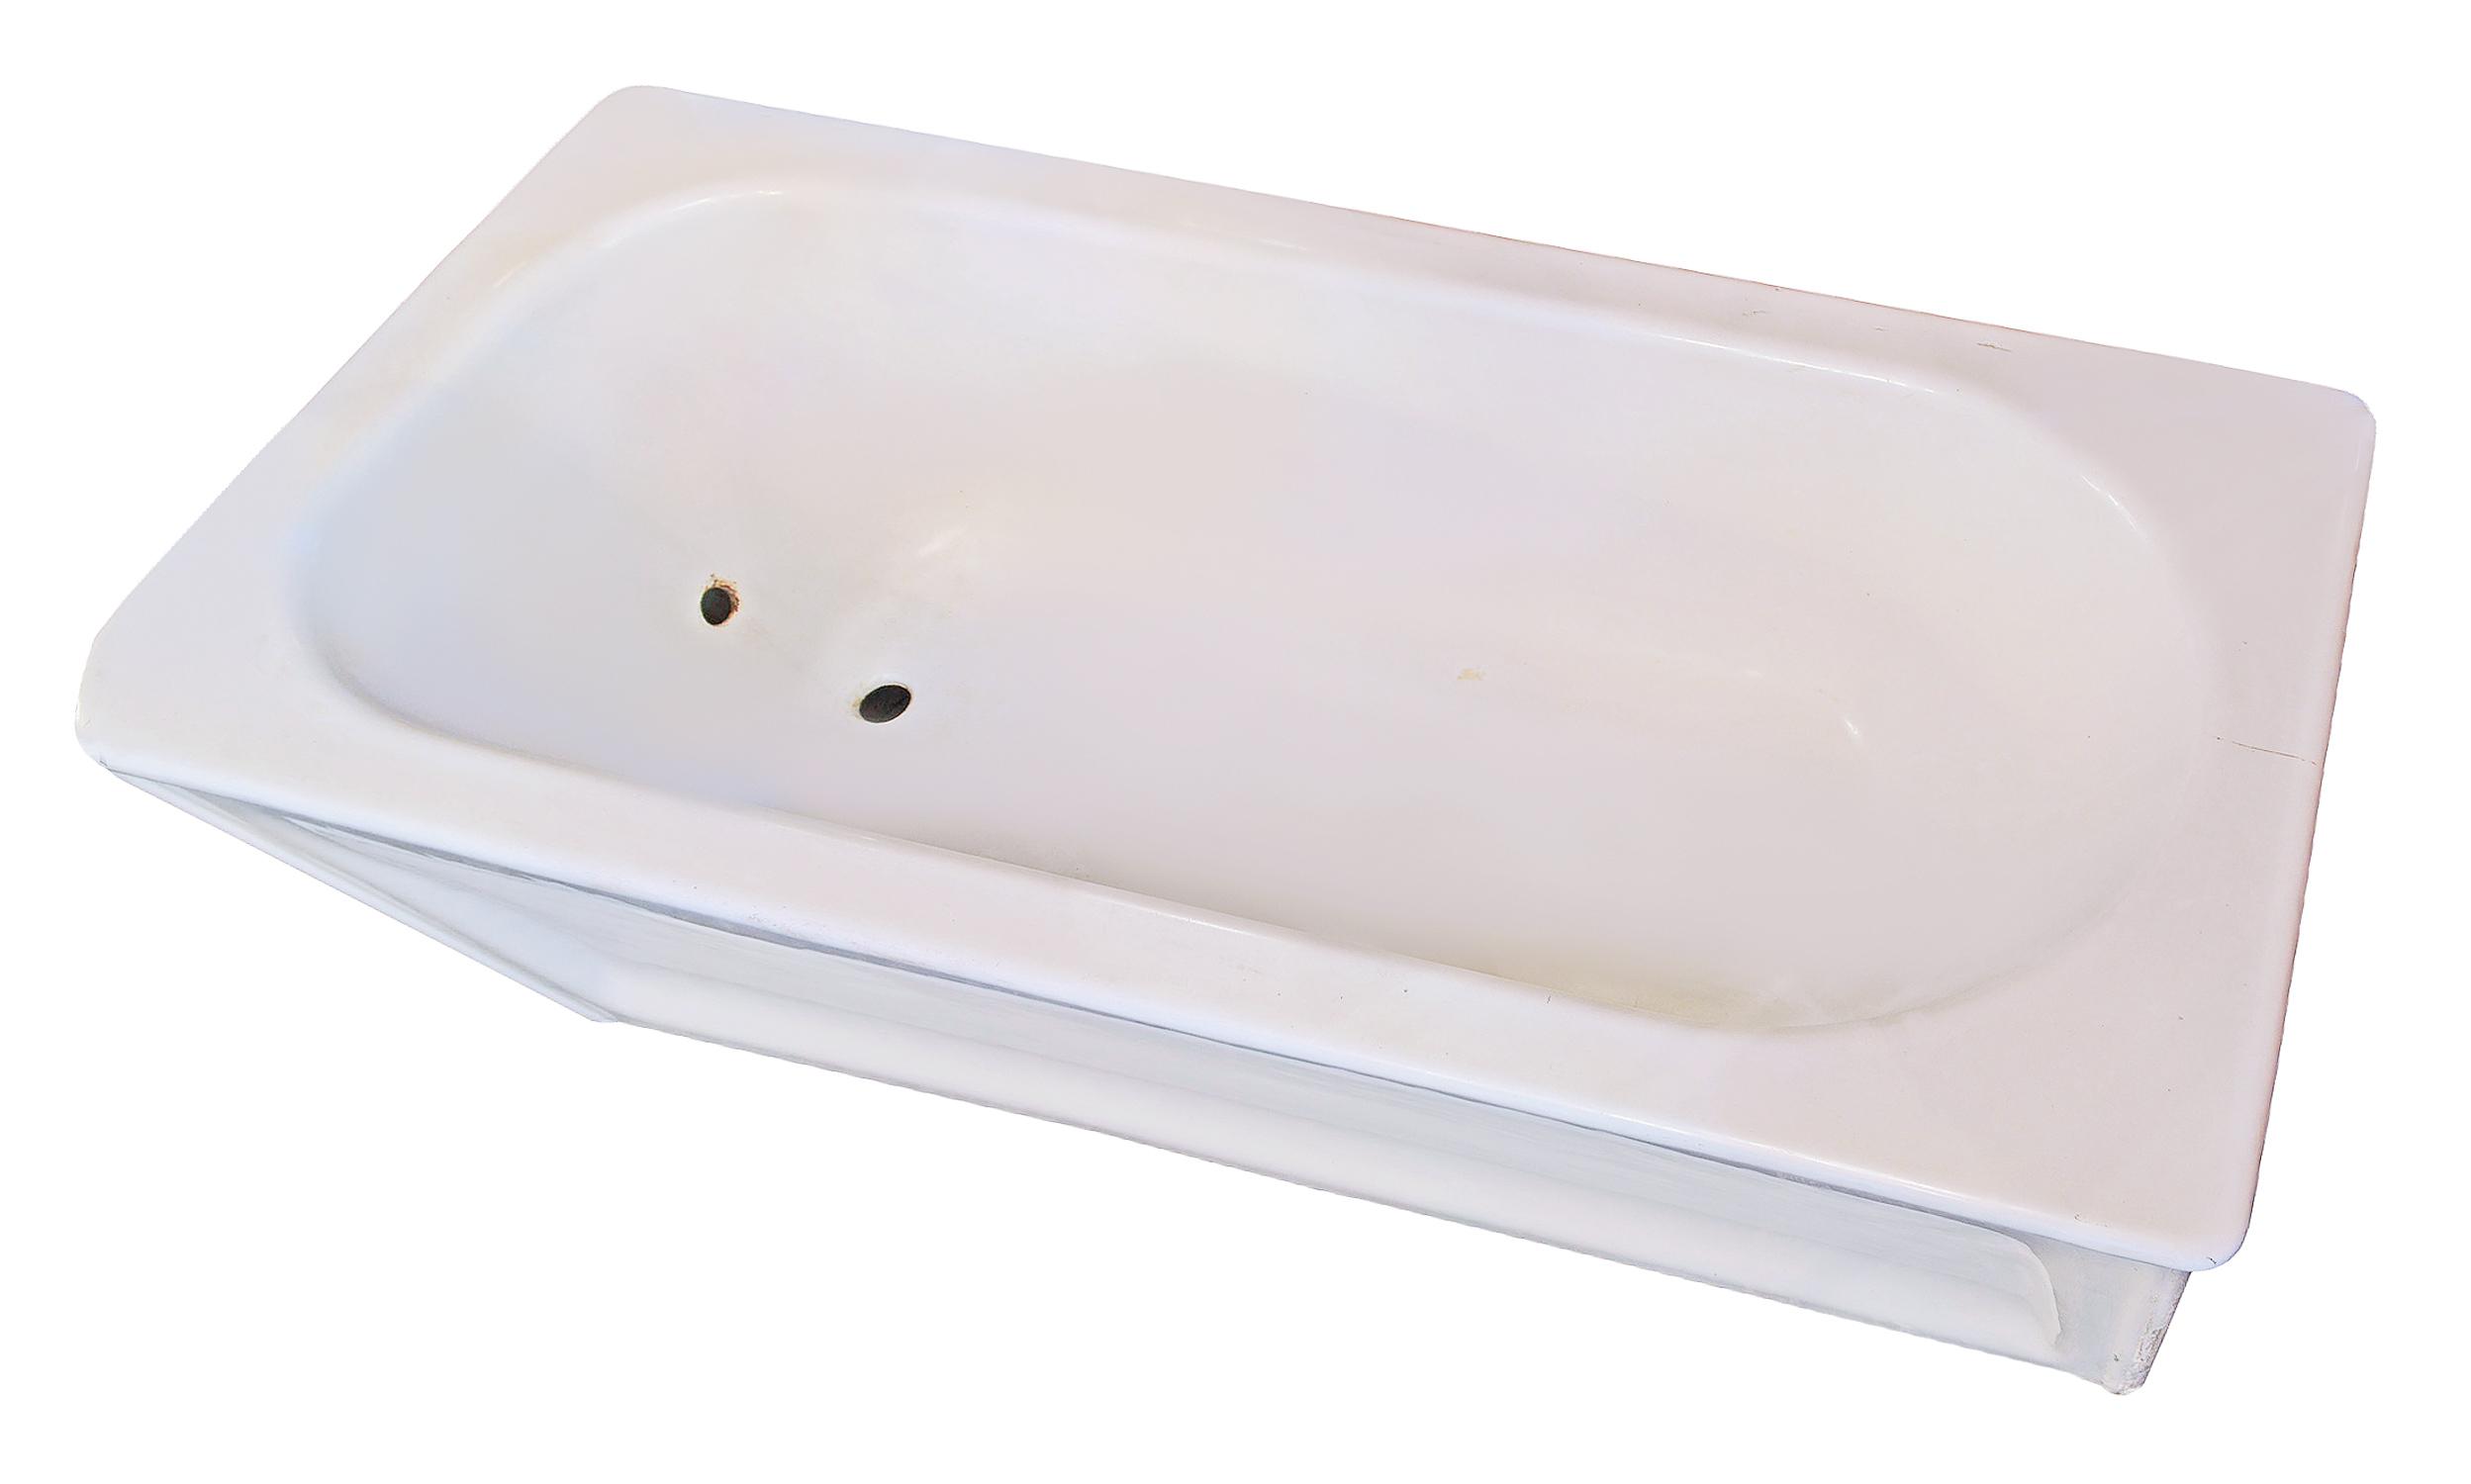 45744-two-sided-enamel-tub-top.jpg